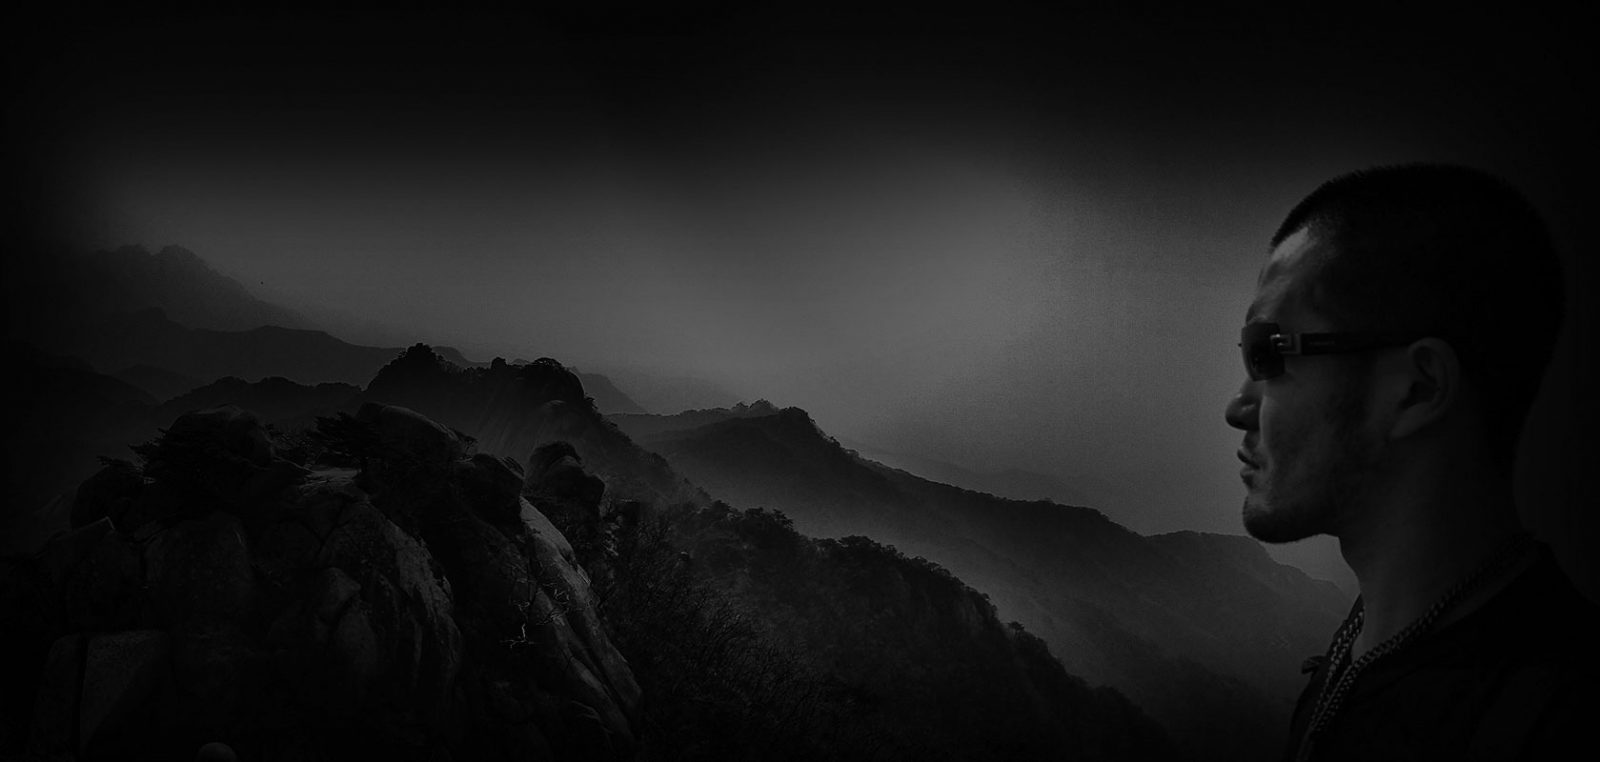 Selfie From an Island Cliff in Tongyeong, South Korea - VINJABOND